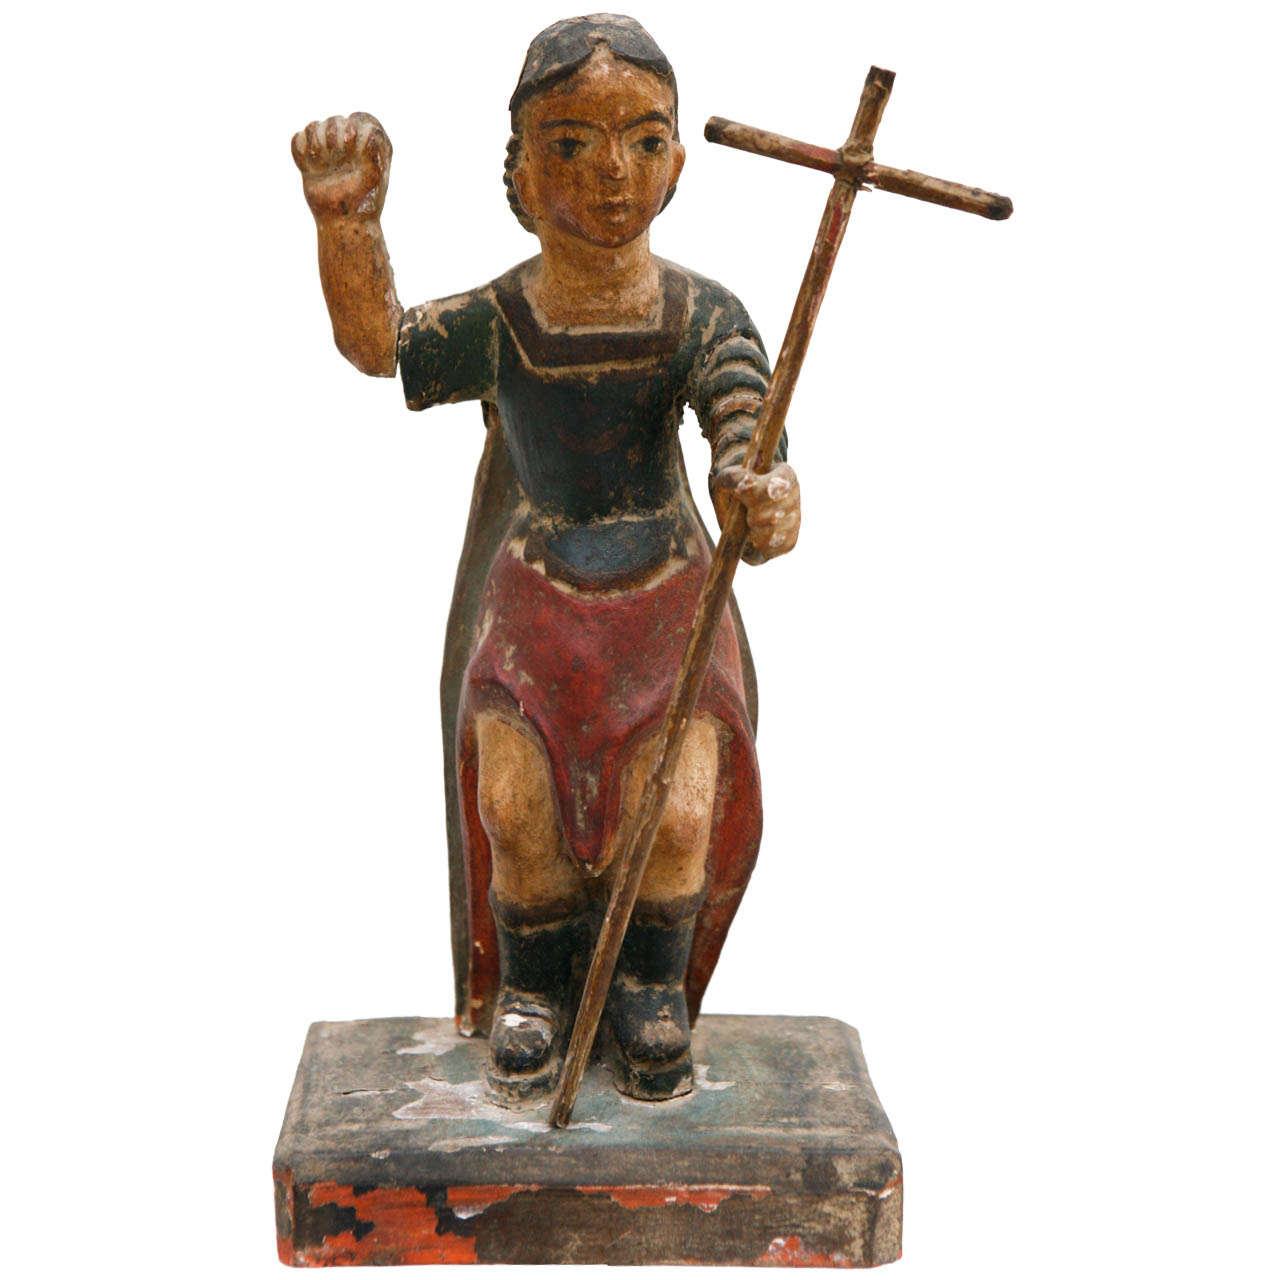 19th Century Spanish Colonial Bultos Figure, Likely San Miguel